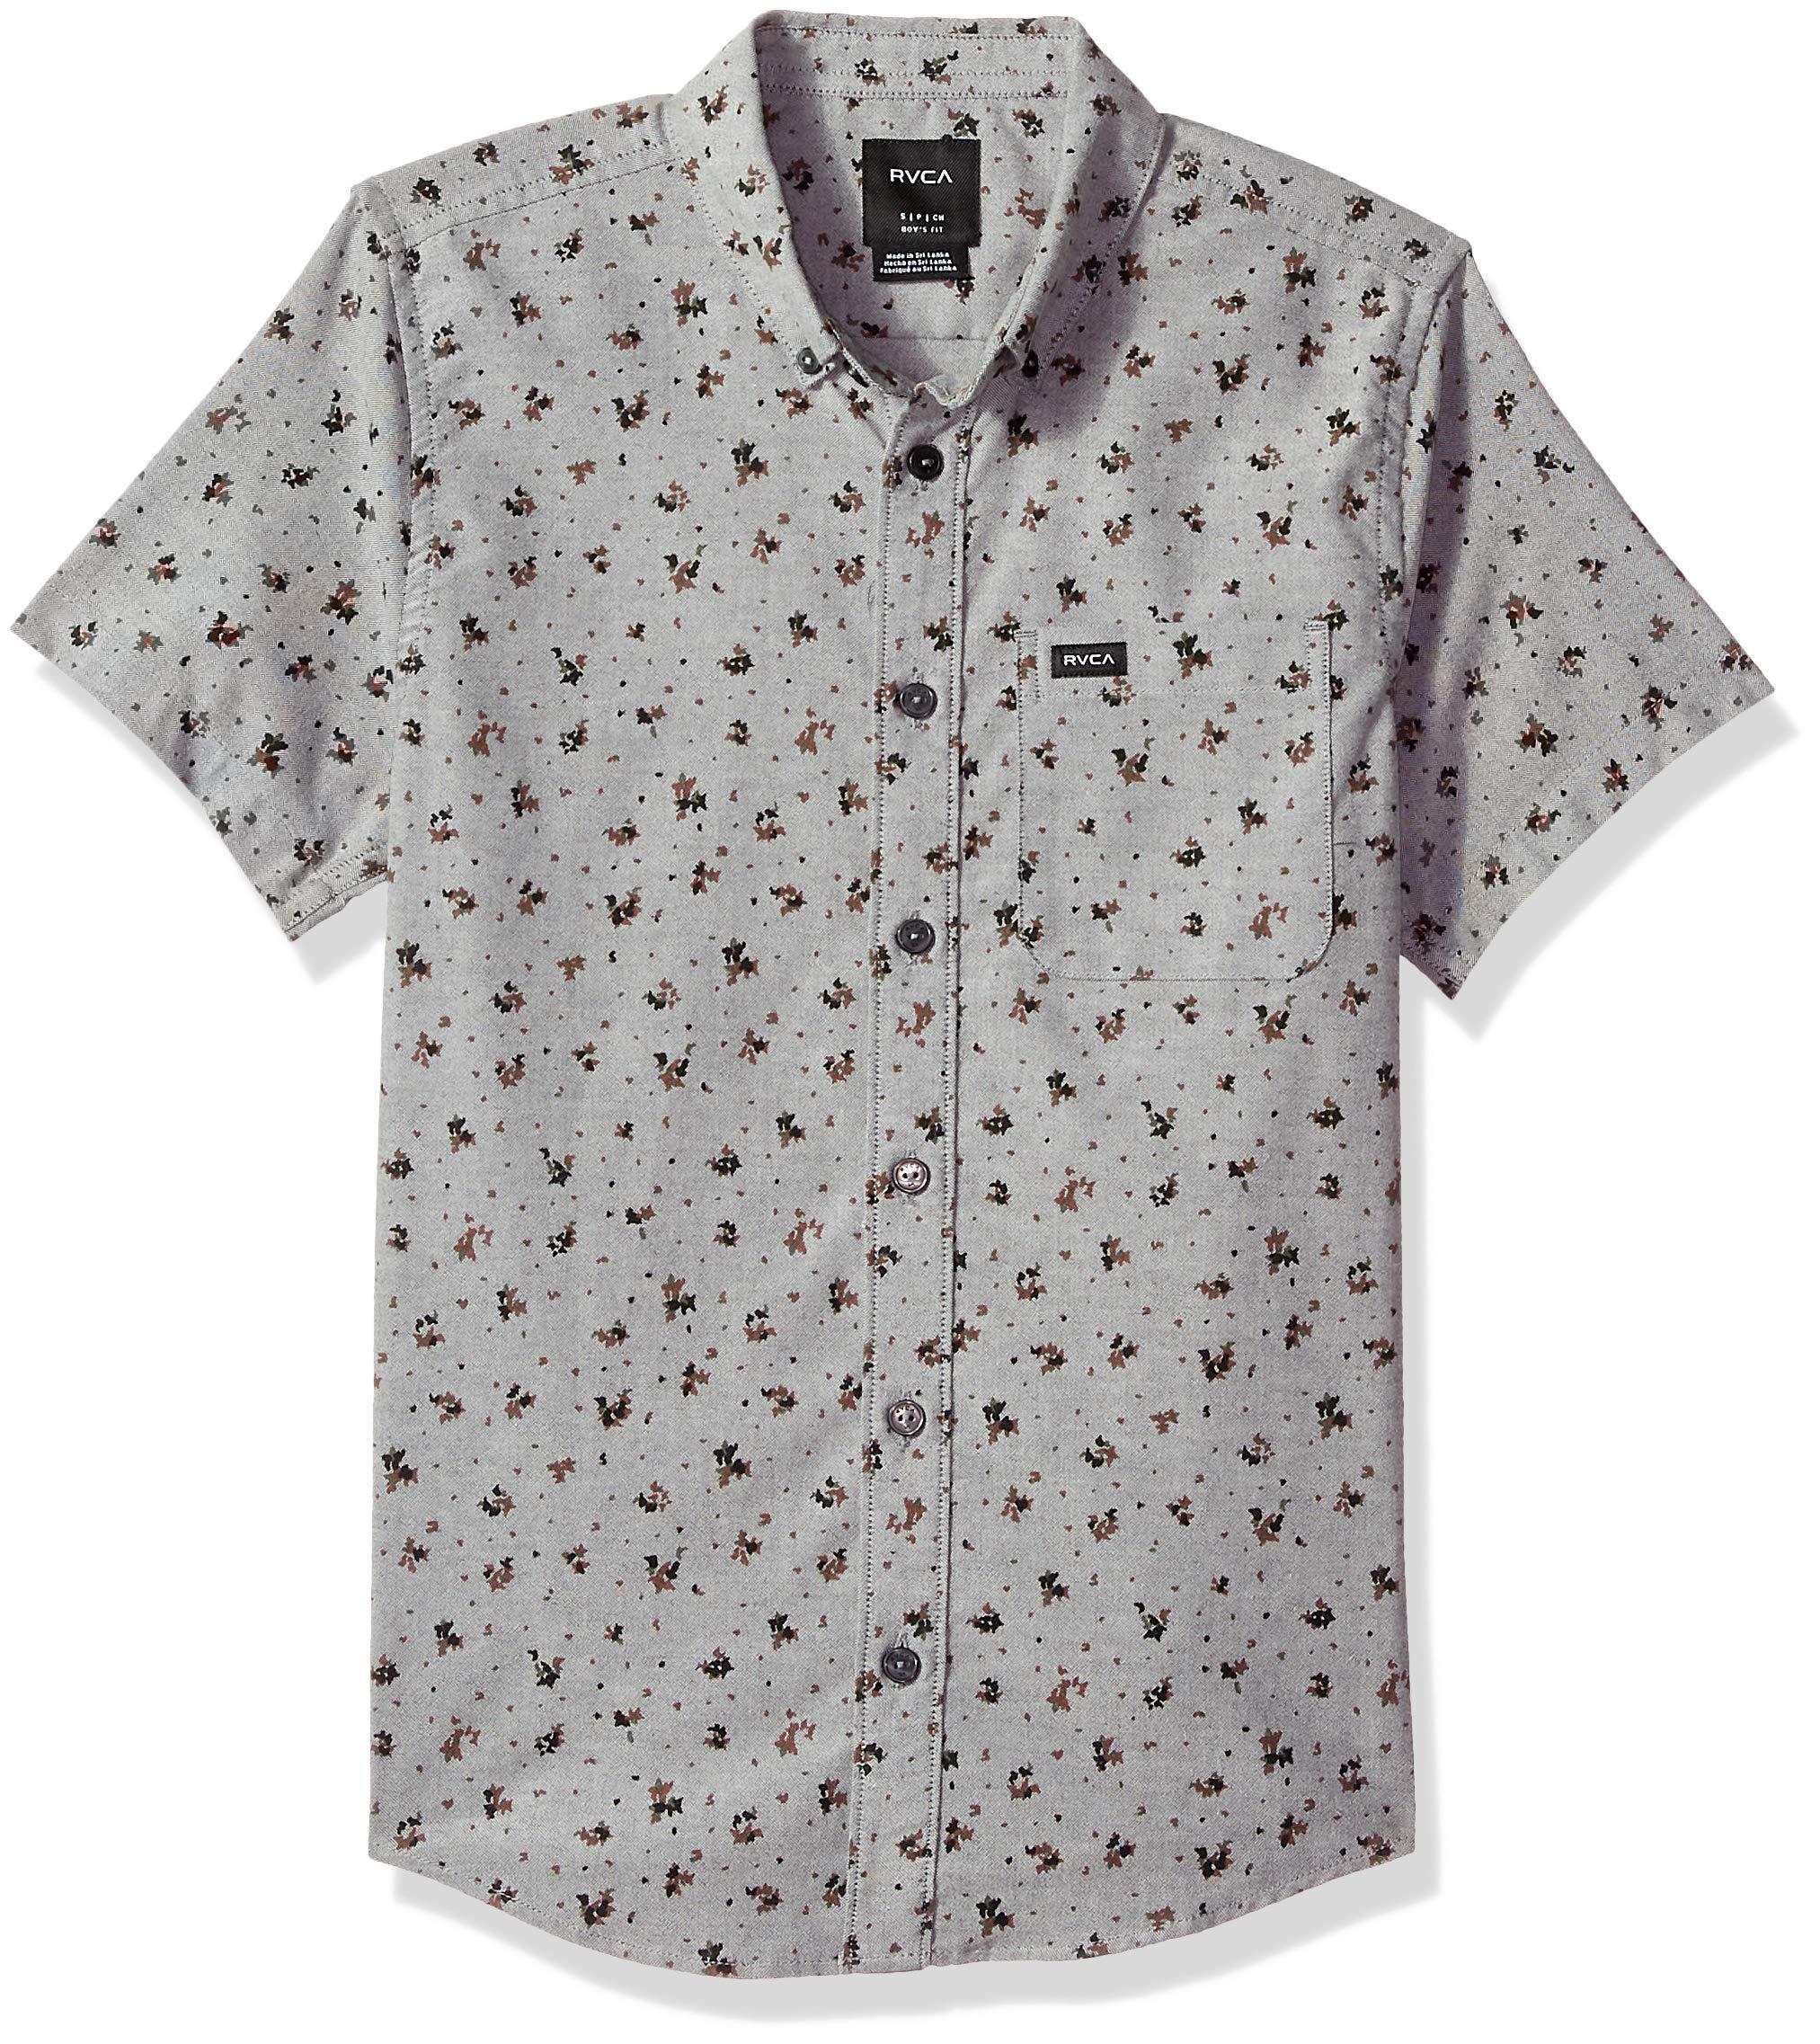 RVCA Boys Thatll DO Print Woven Short Sleeve Button UP Shirt, Pavement XL